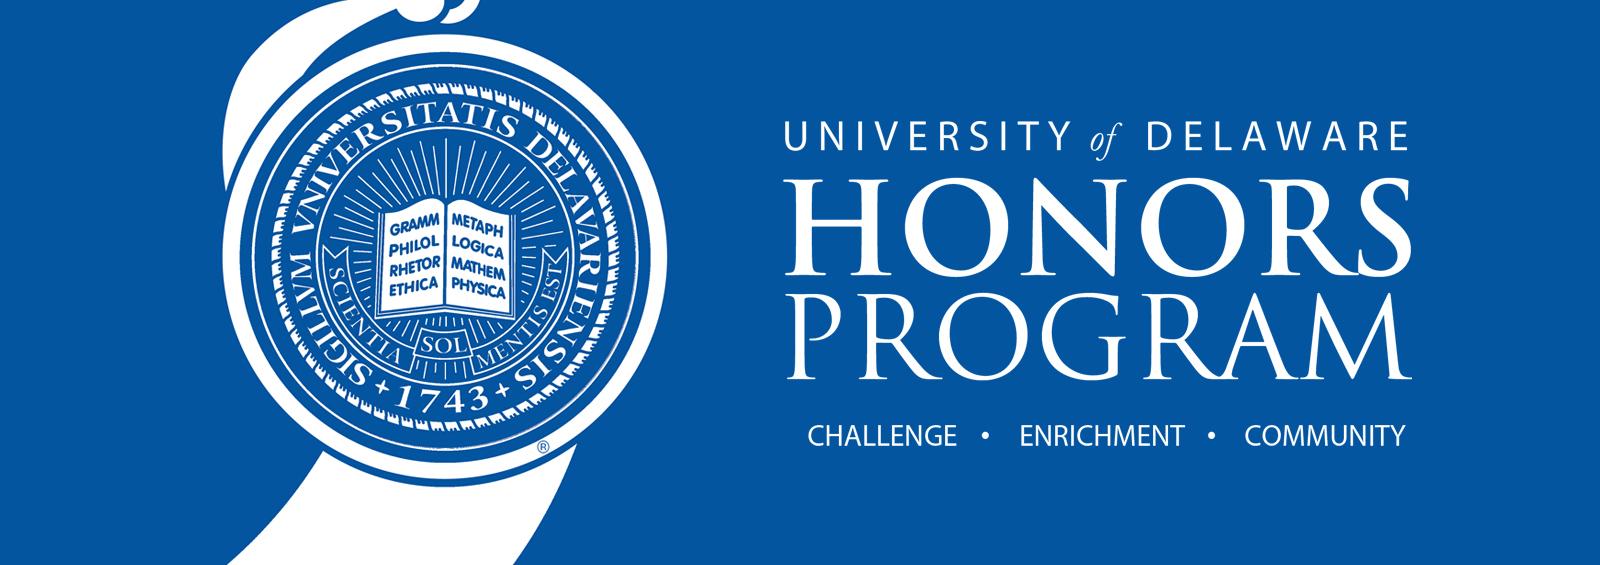 udel honors program essay